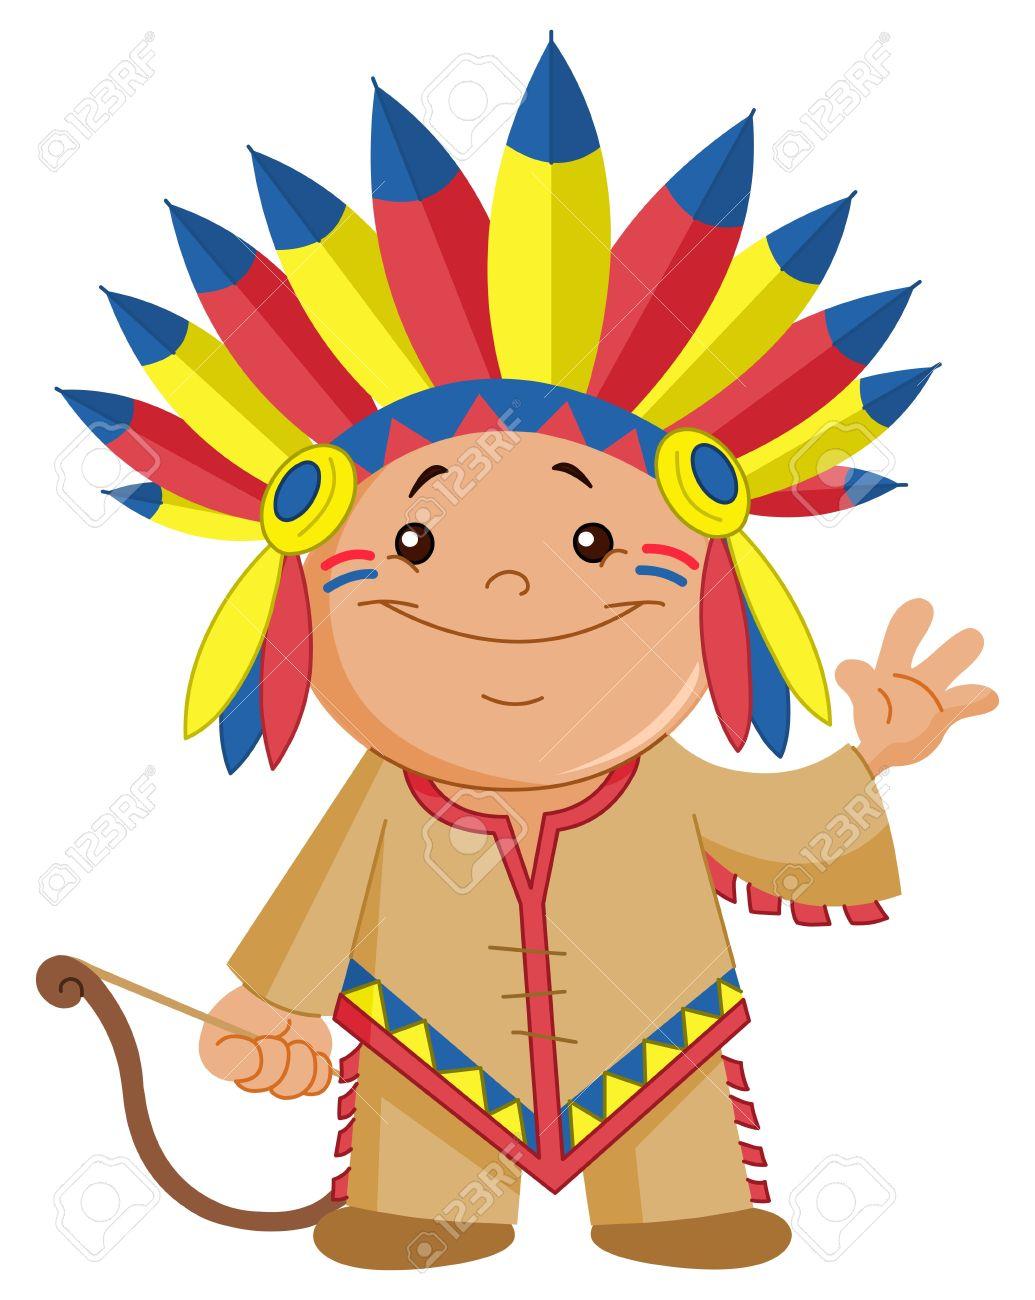 Indian Kid Waving Hello Royalty Free Cliparts, Vectors, And Stock ...